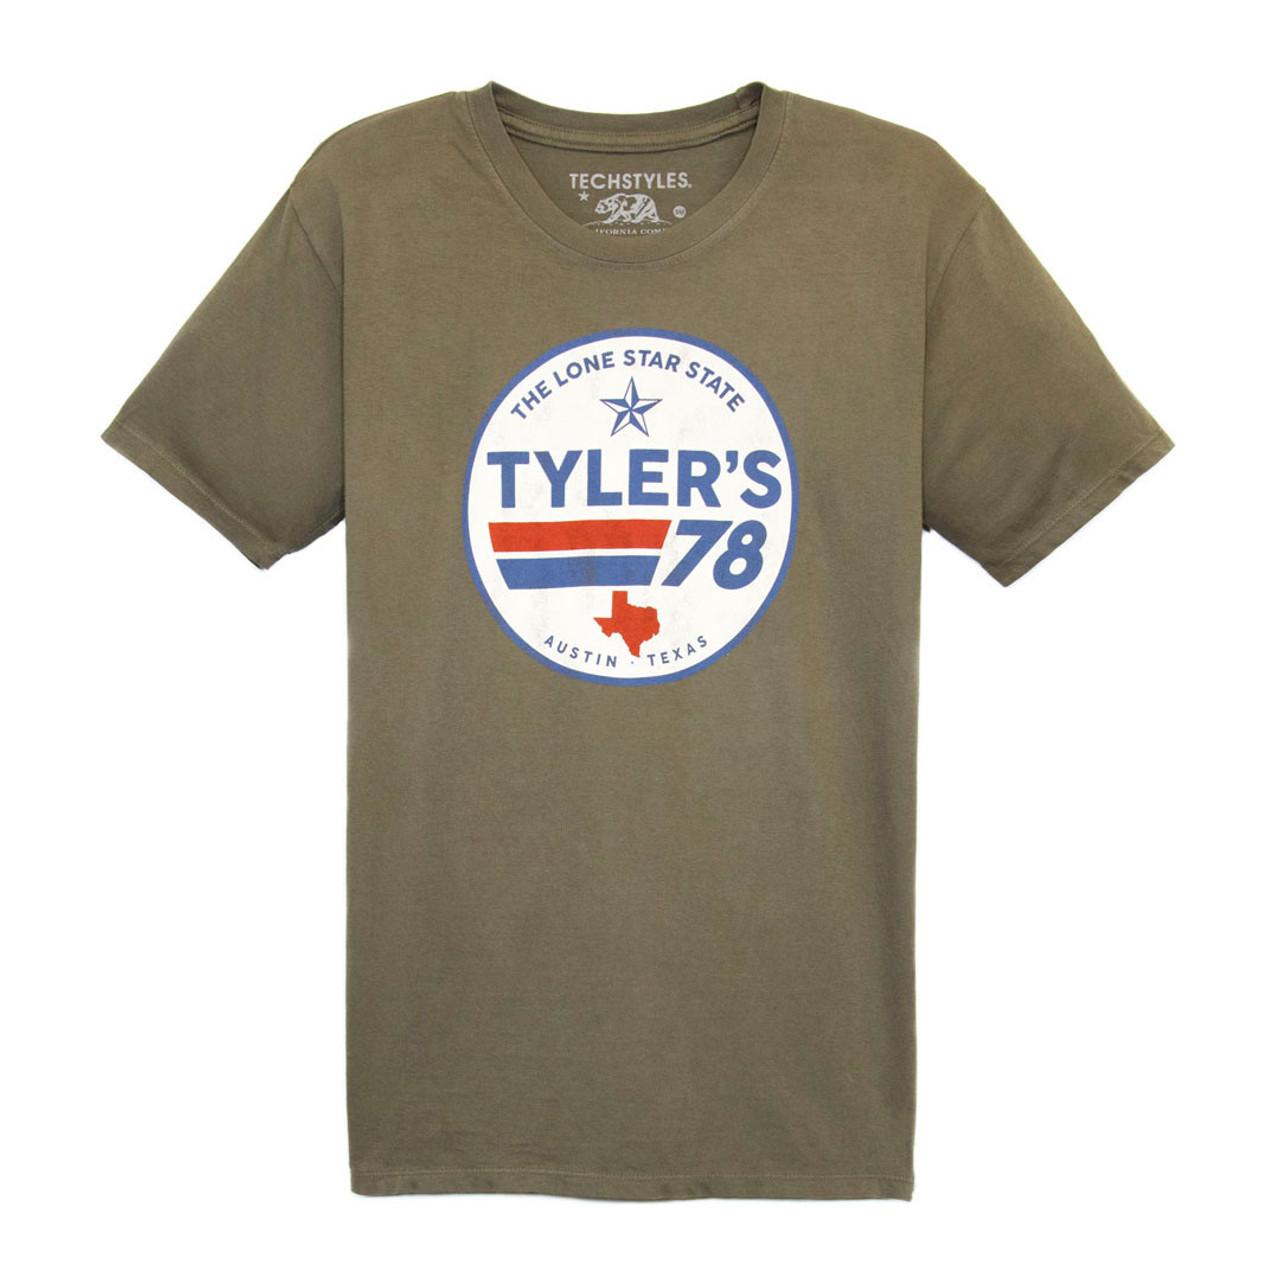 e53c49f10 TYLER'S Cactus Buress Tee - TYLER'S